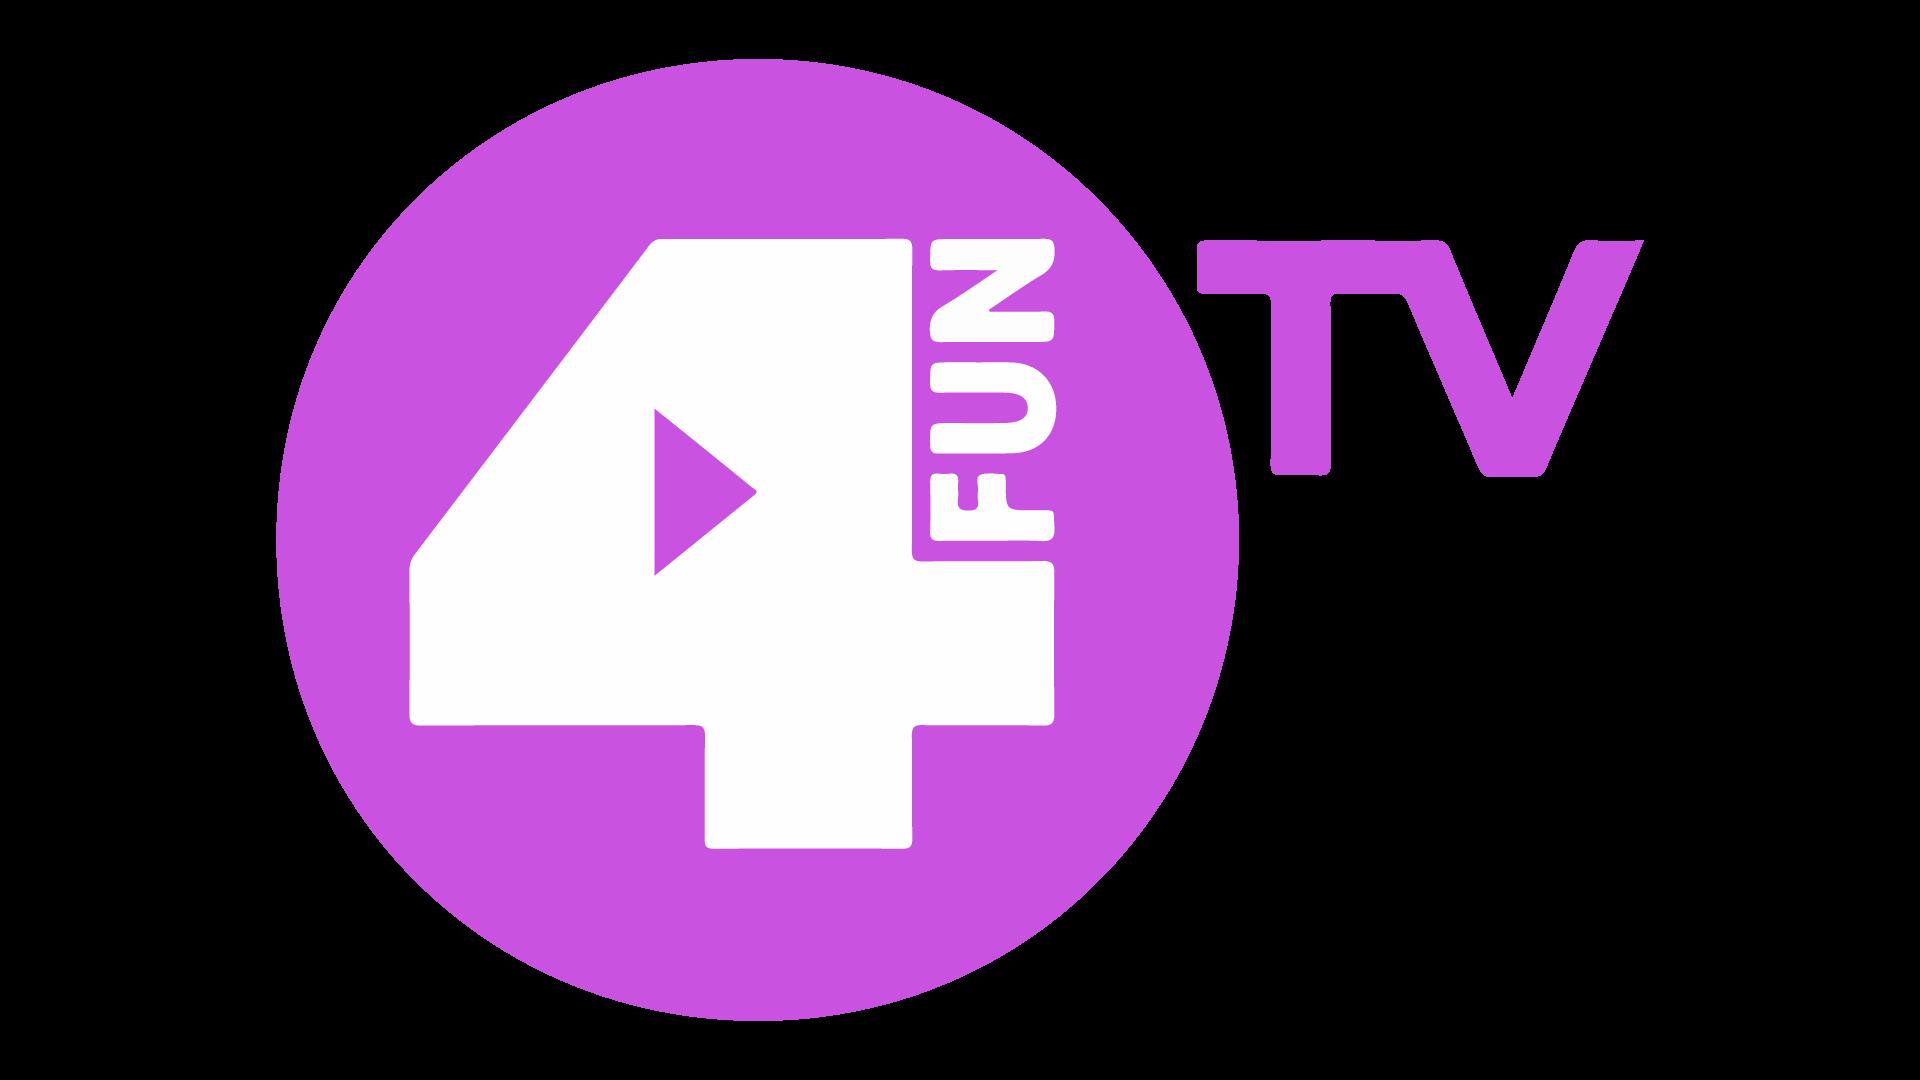 4fun.tv Live TV, Online